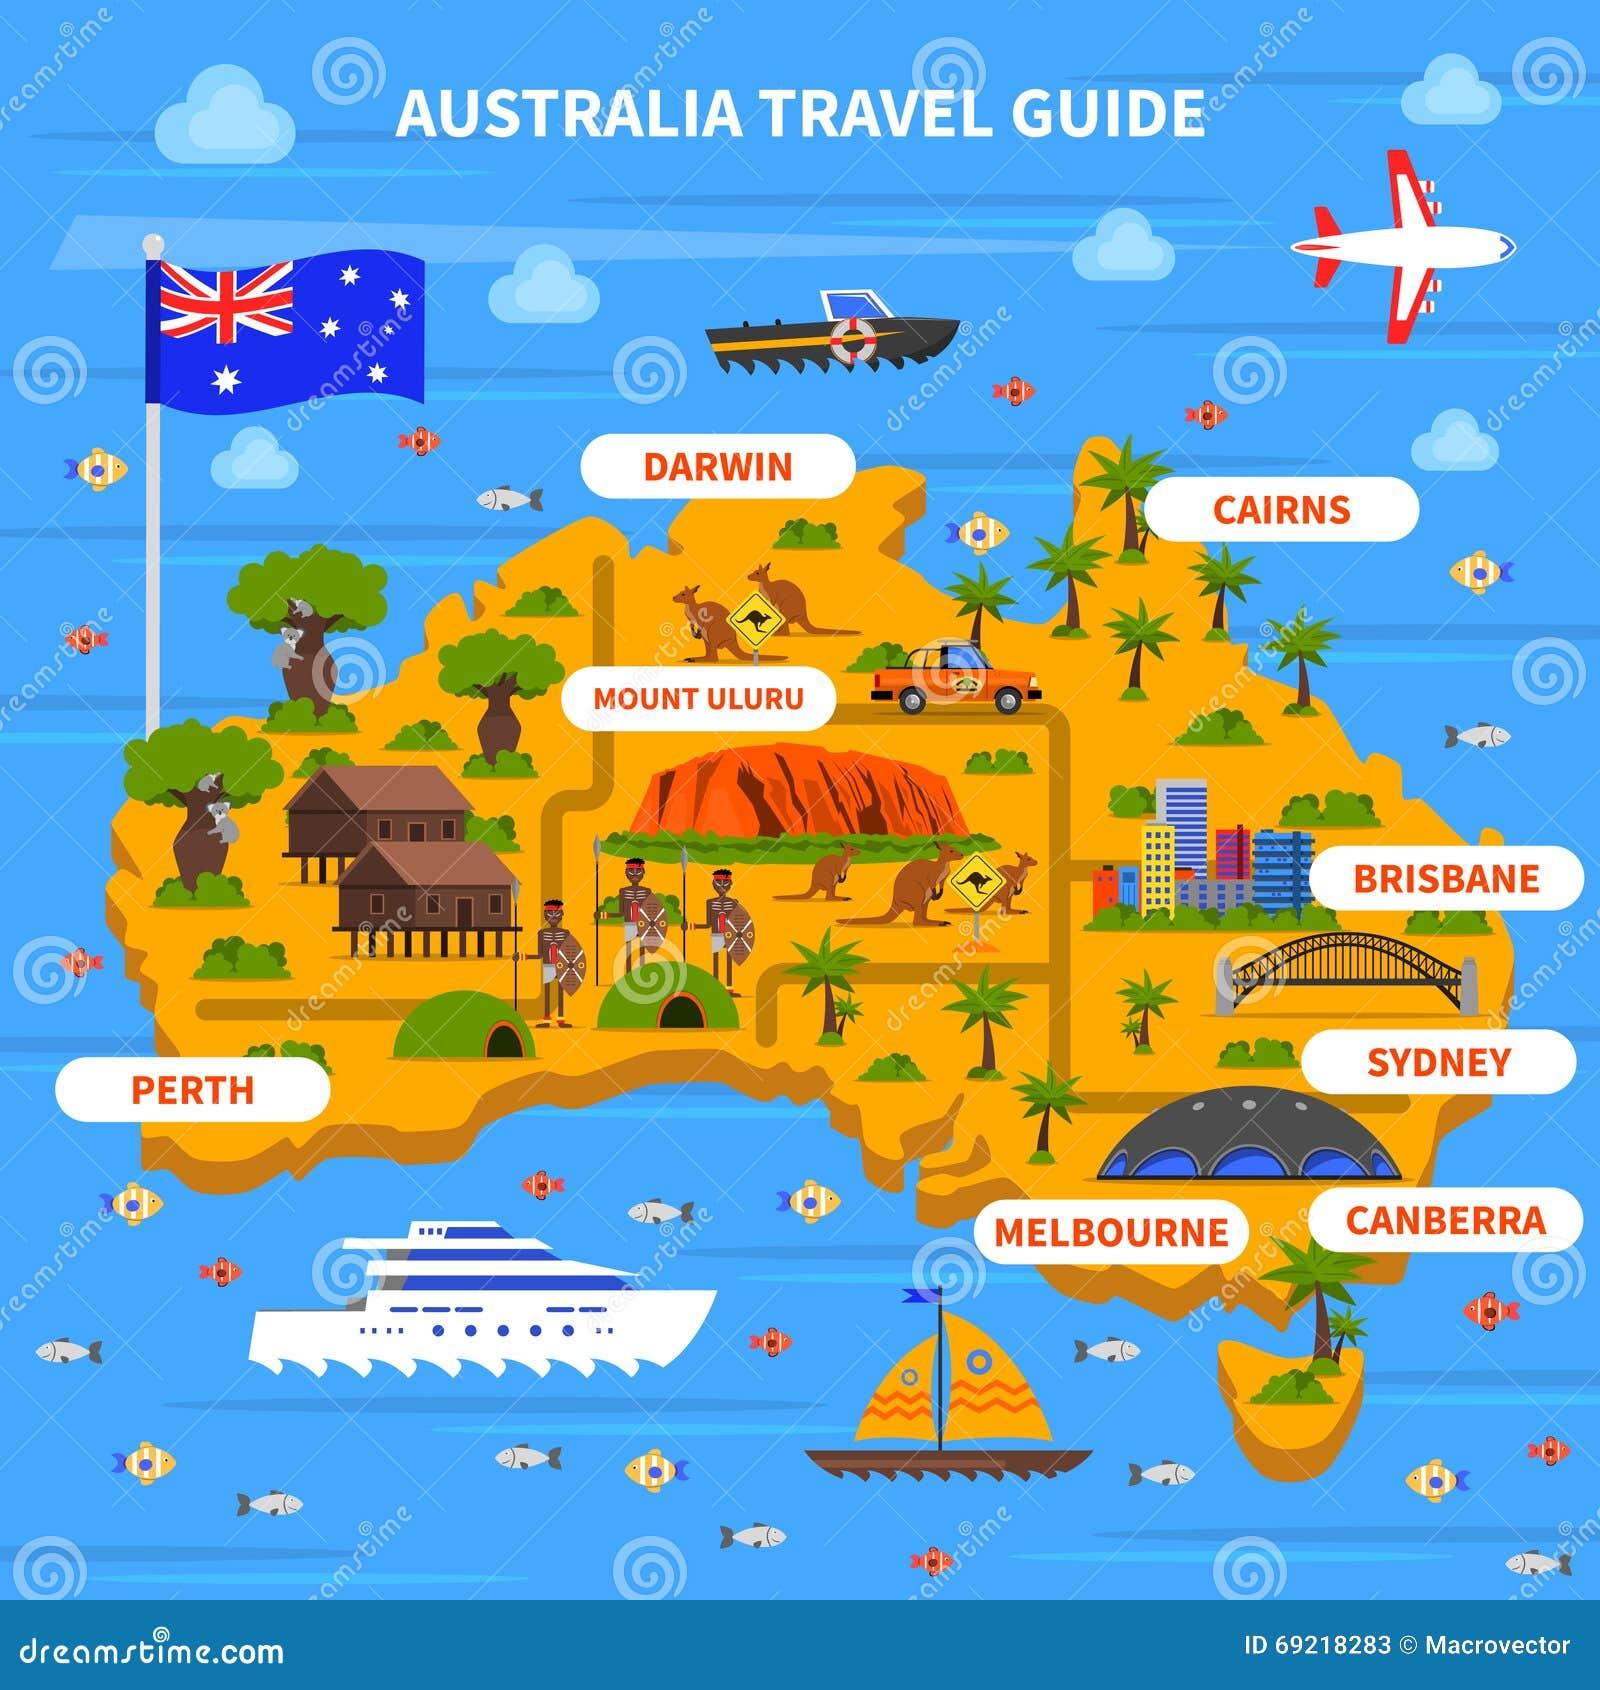 australia travel guide illustration stock illustration illustration 69218283. Black Bedroom Furniture Sets. Home Design Ideas